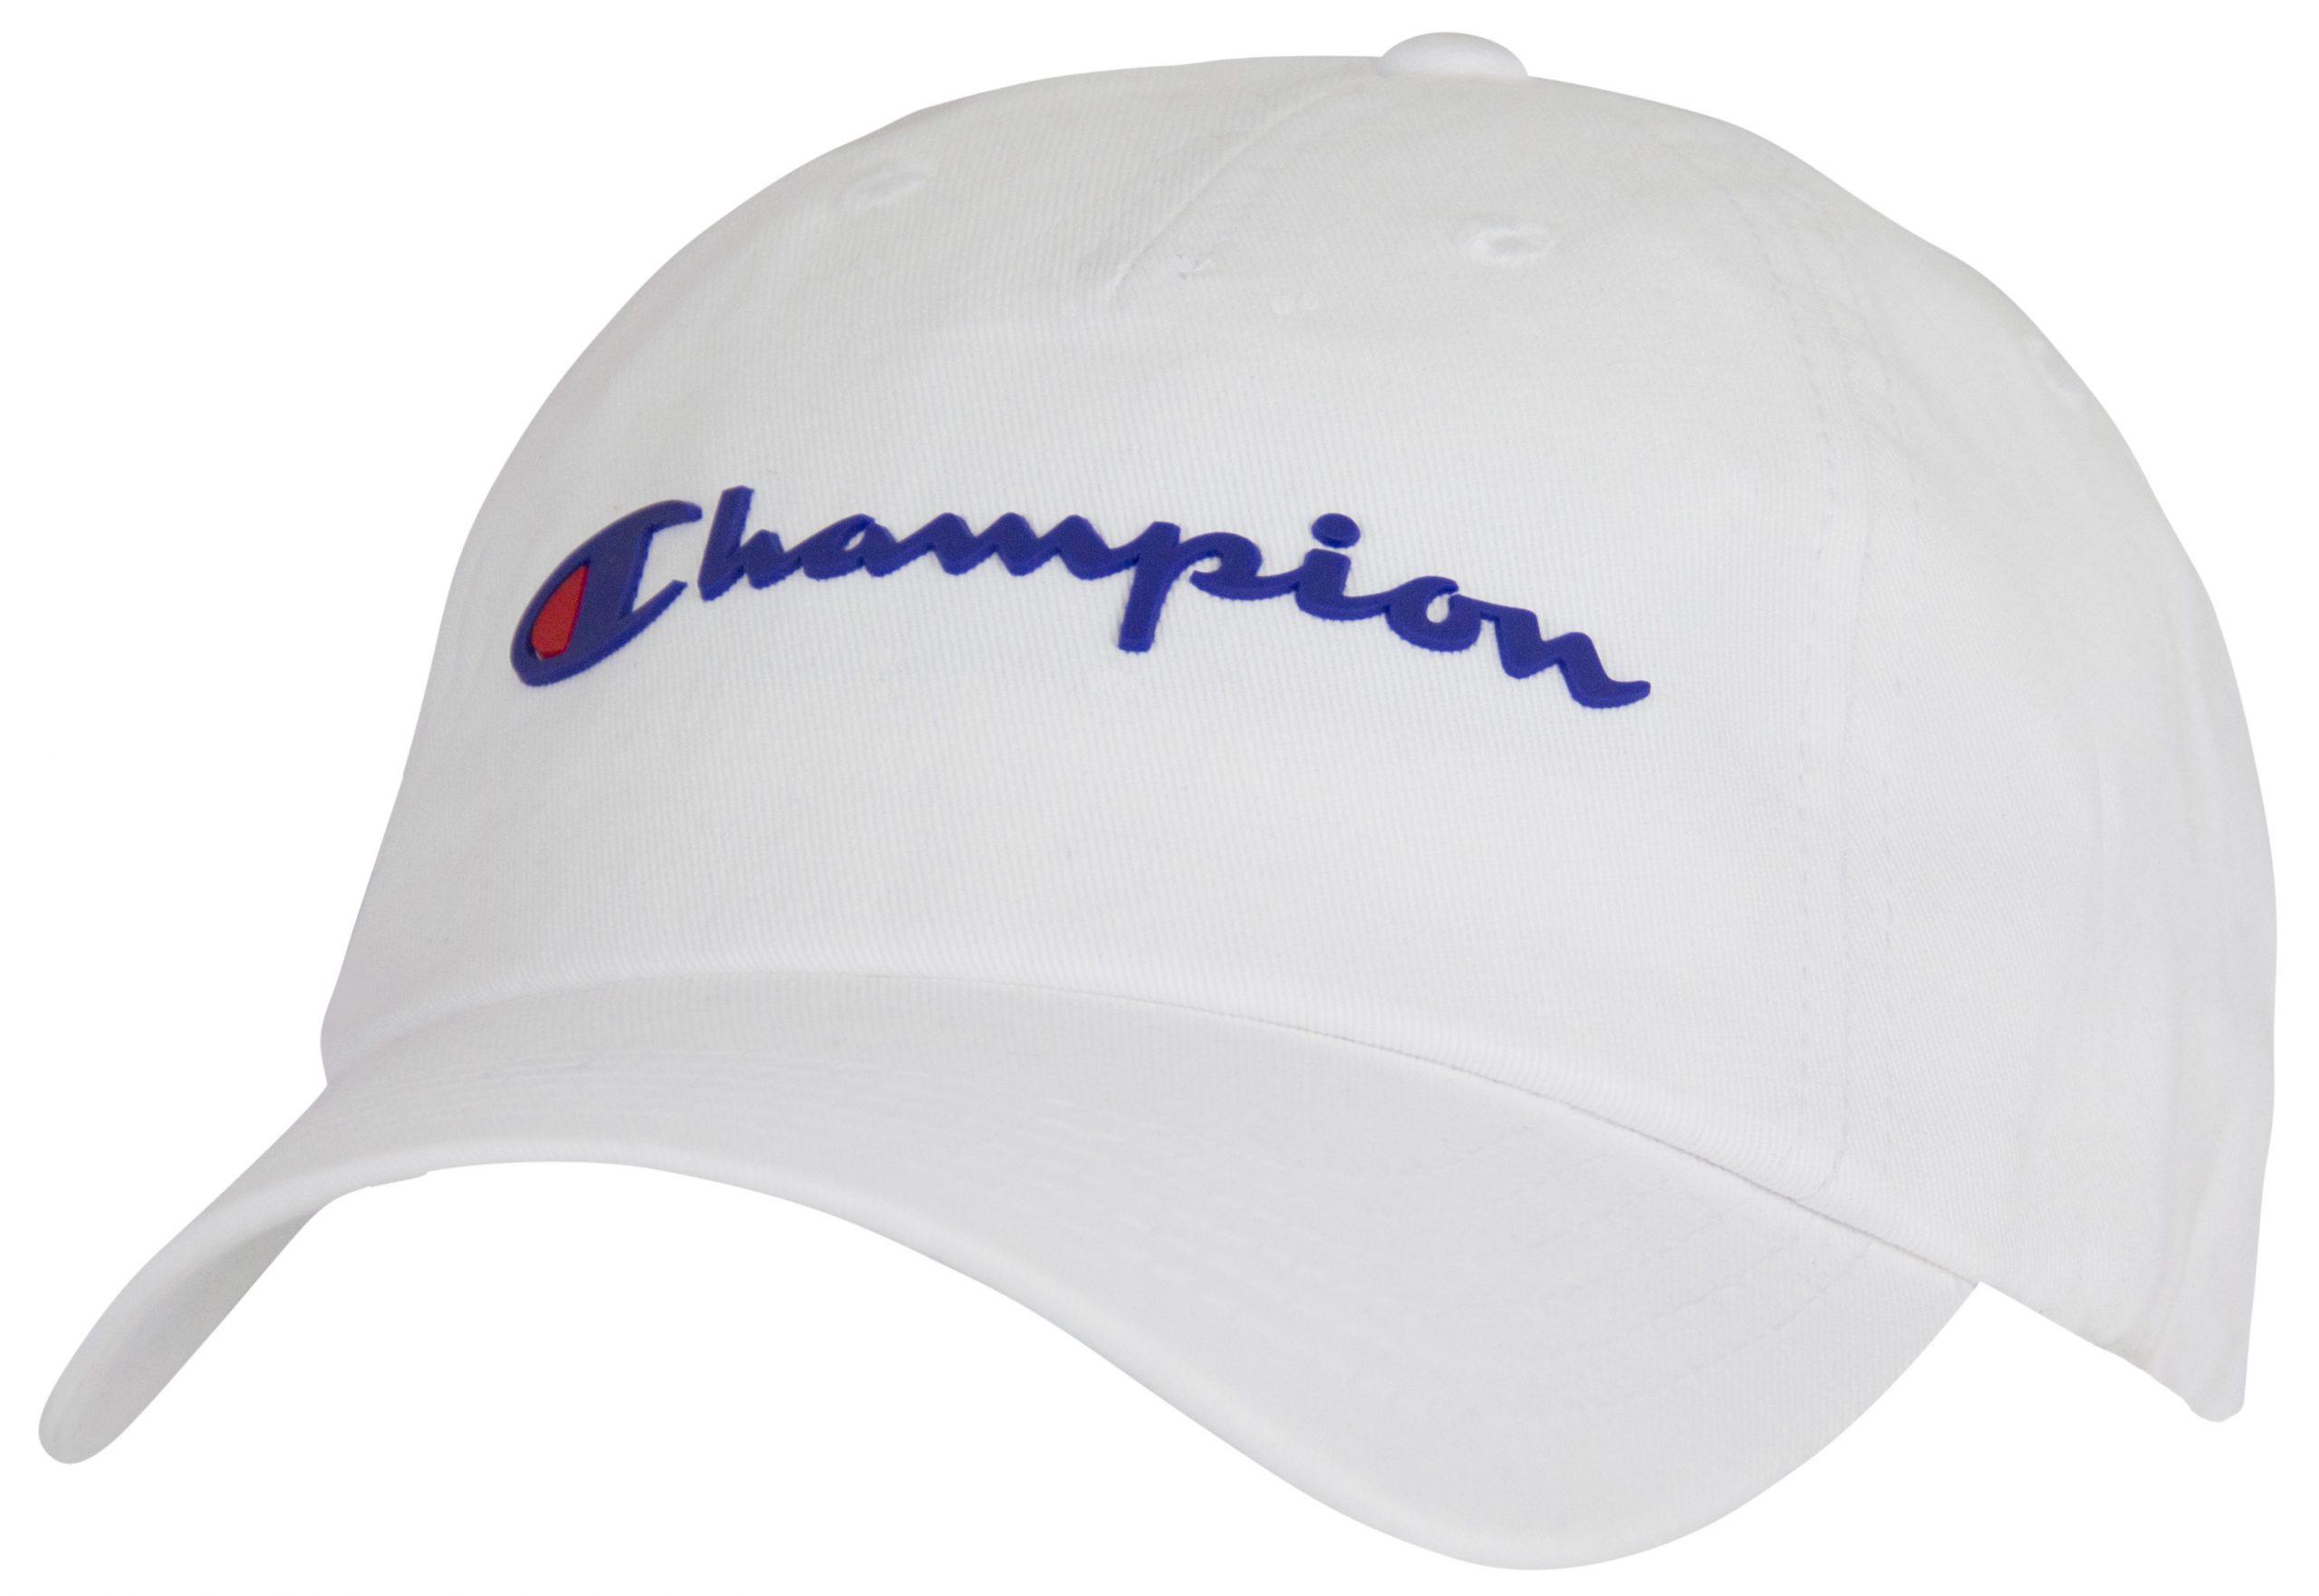 CH2006-105